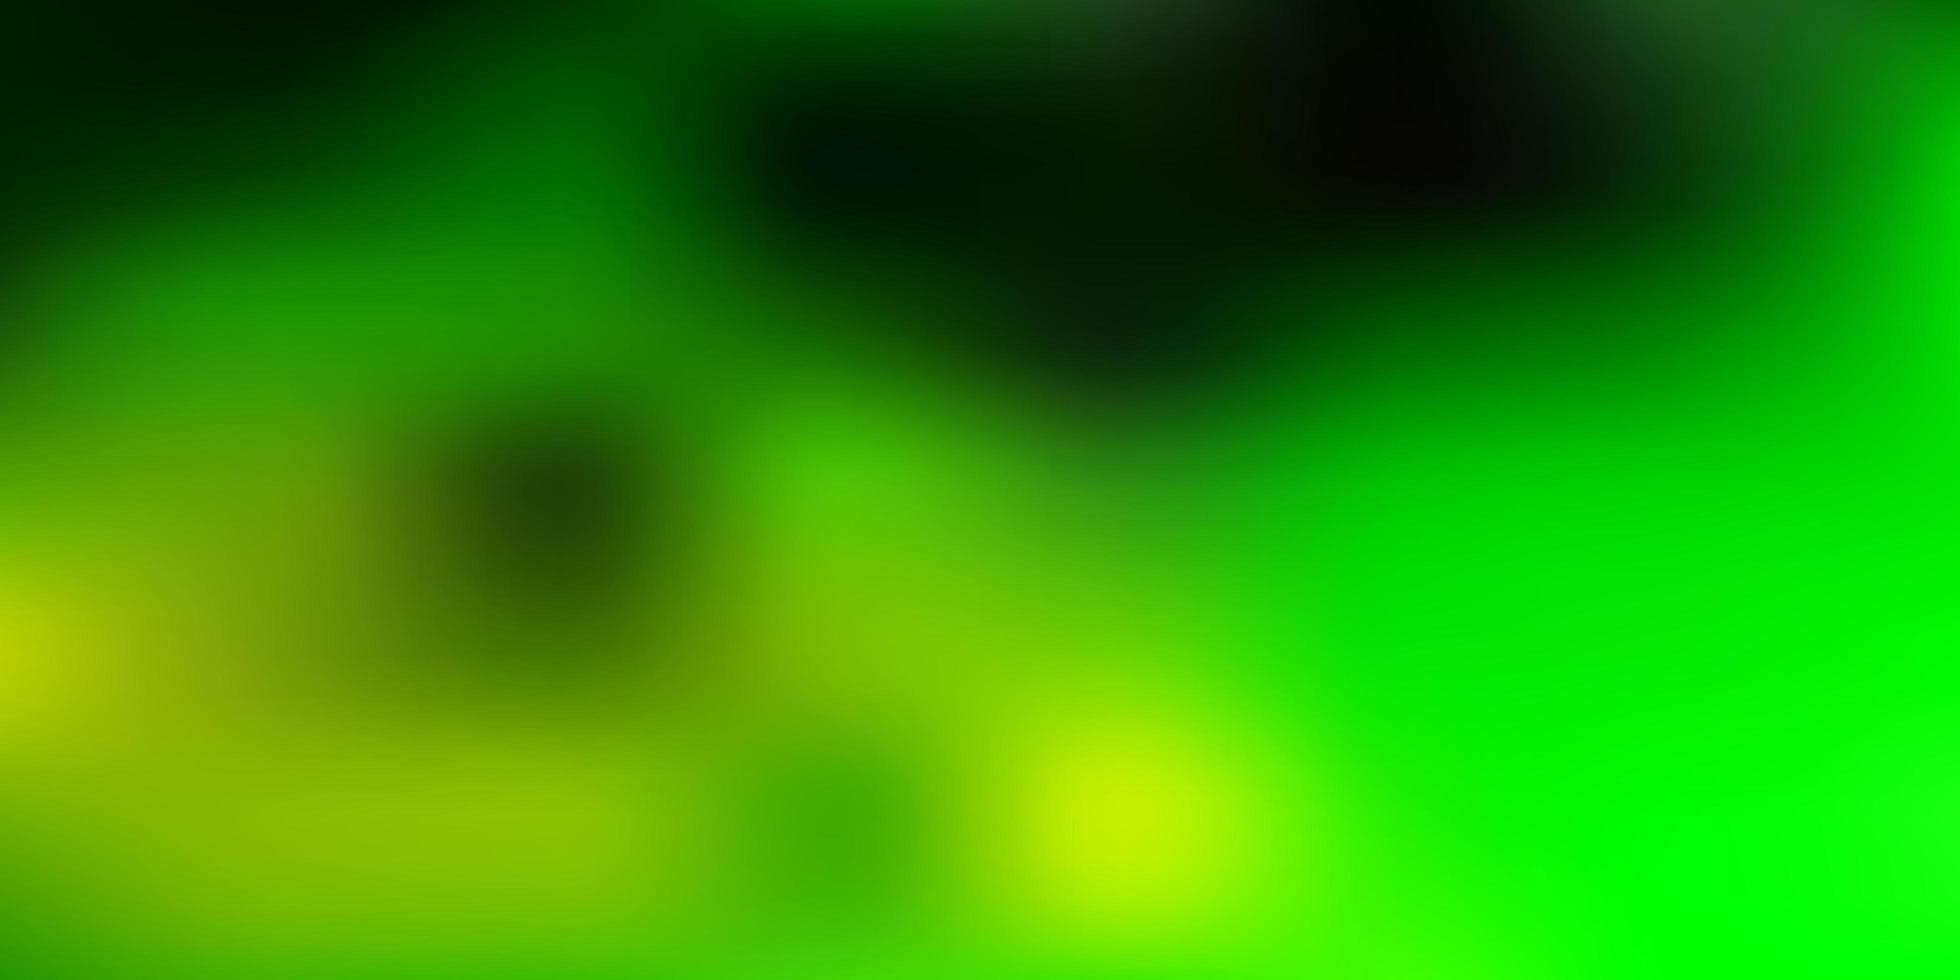 luz verde, amarelo vetor turva padrão.